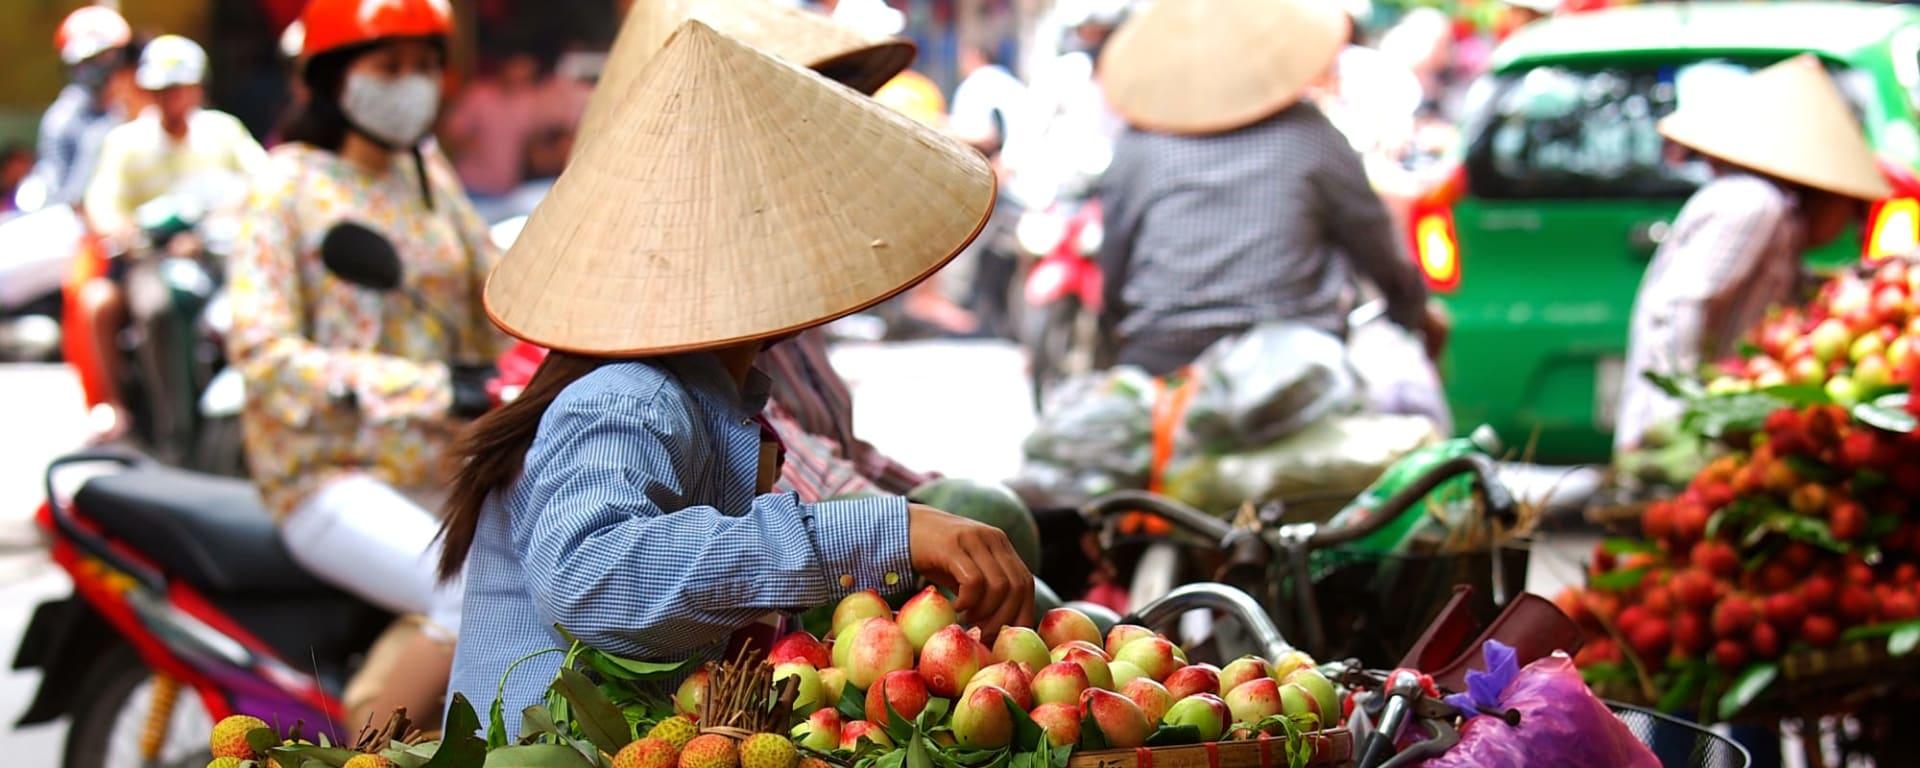 Höhepunkte Vietnams ab Hanoi: Vietnam Strassenverkaeufer